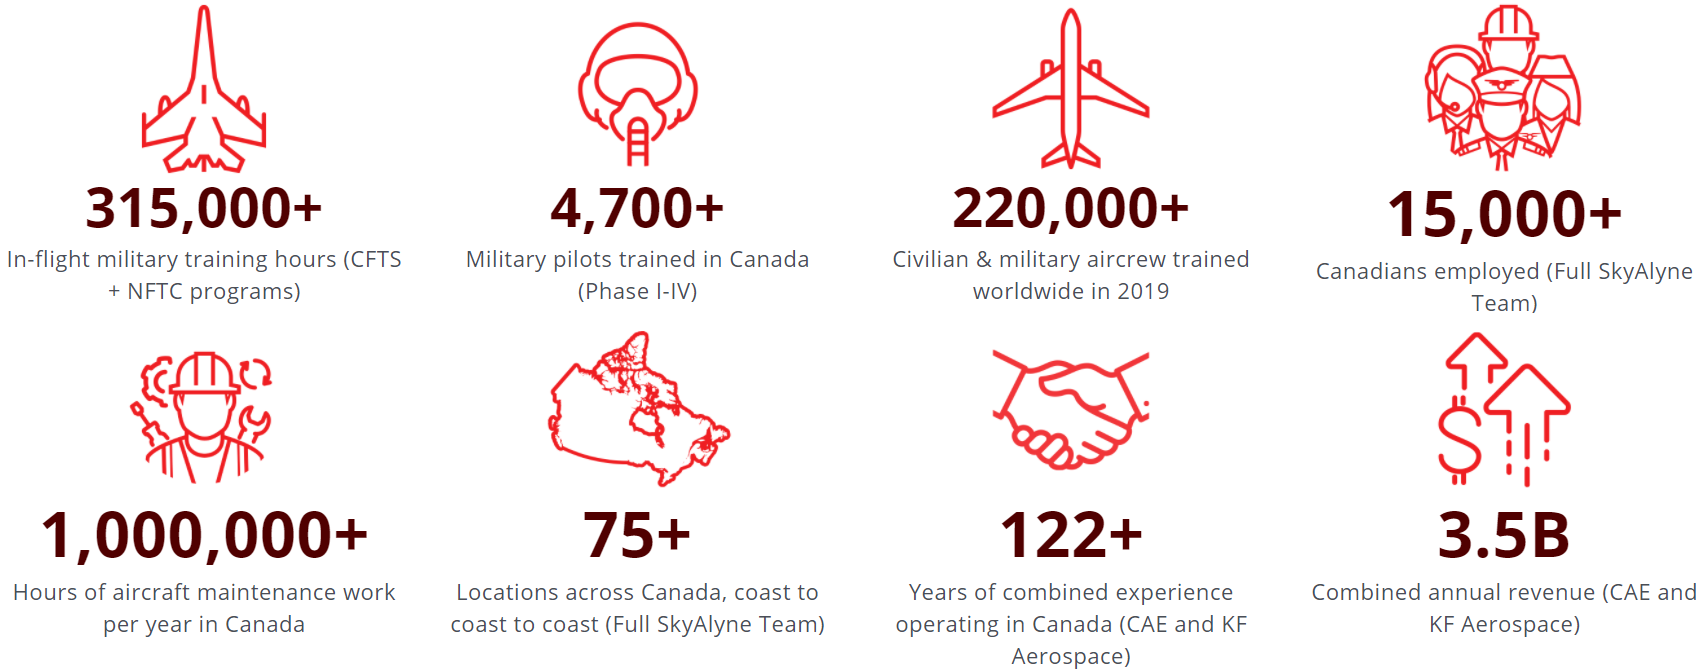 skyalyne canada future aircrew training economic benefits